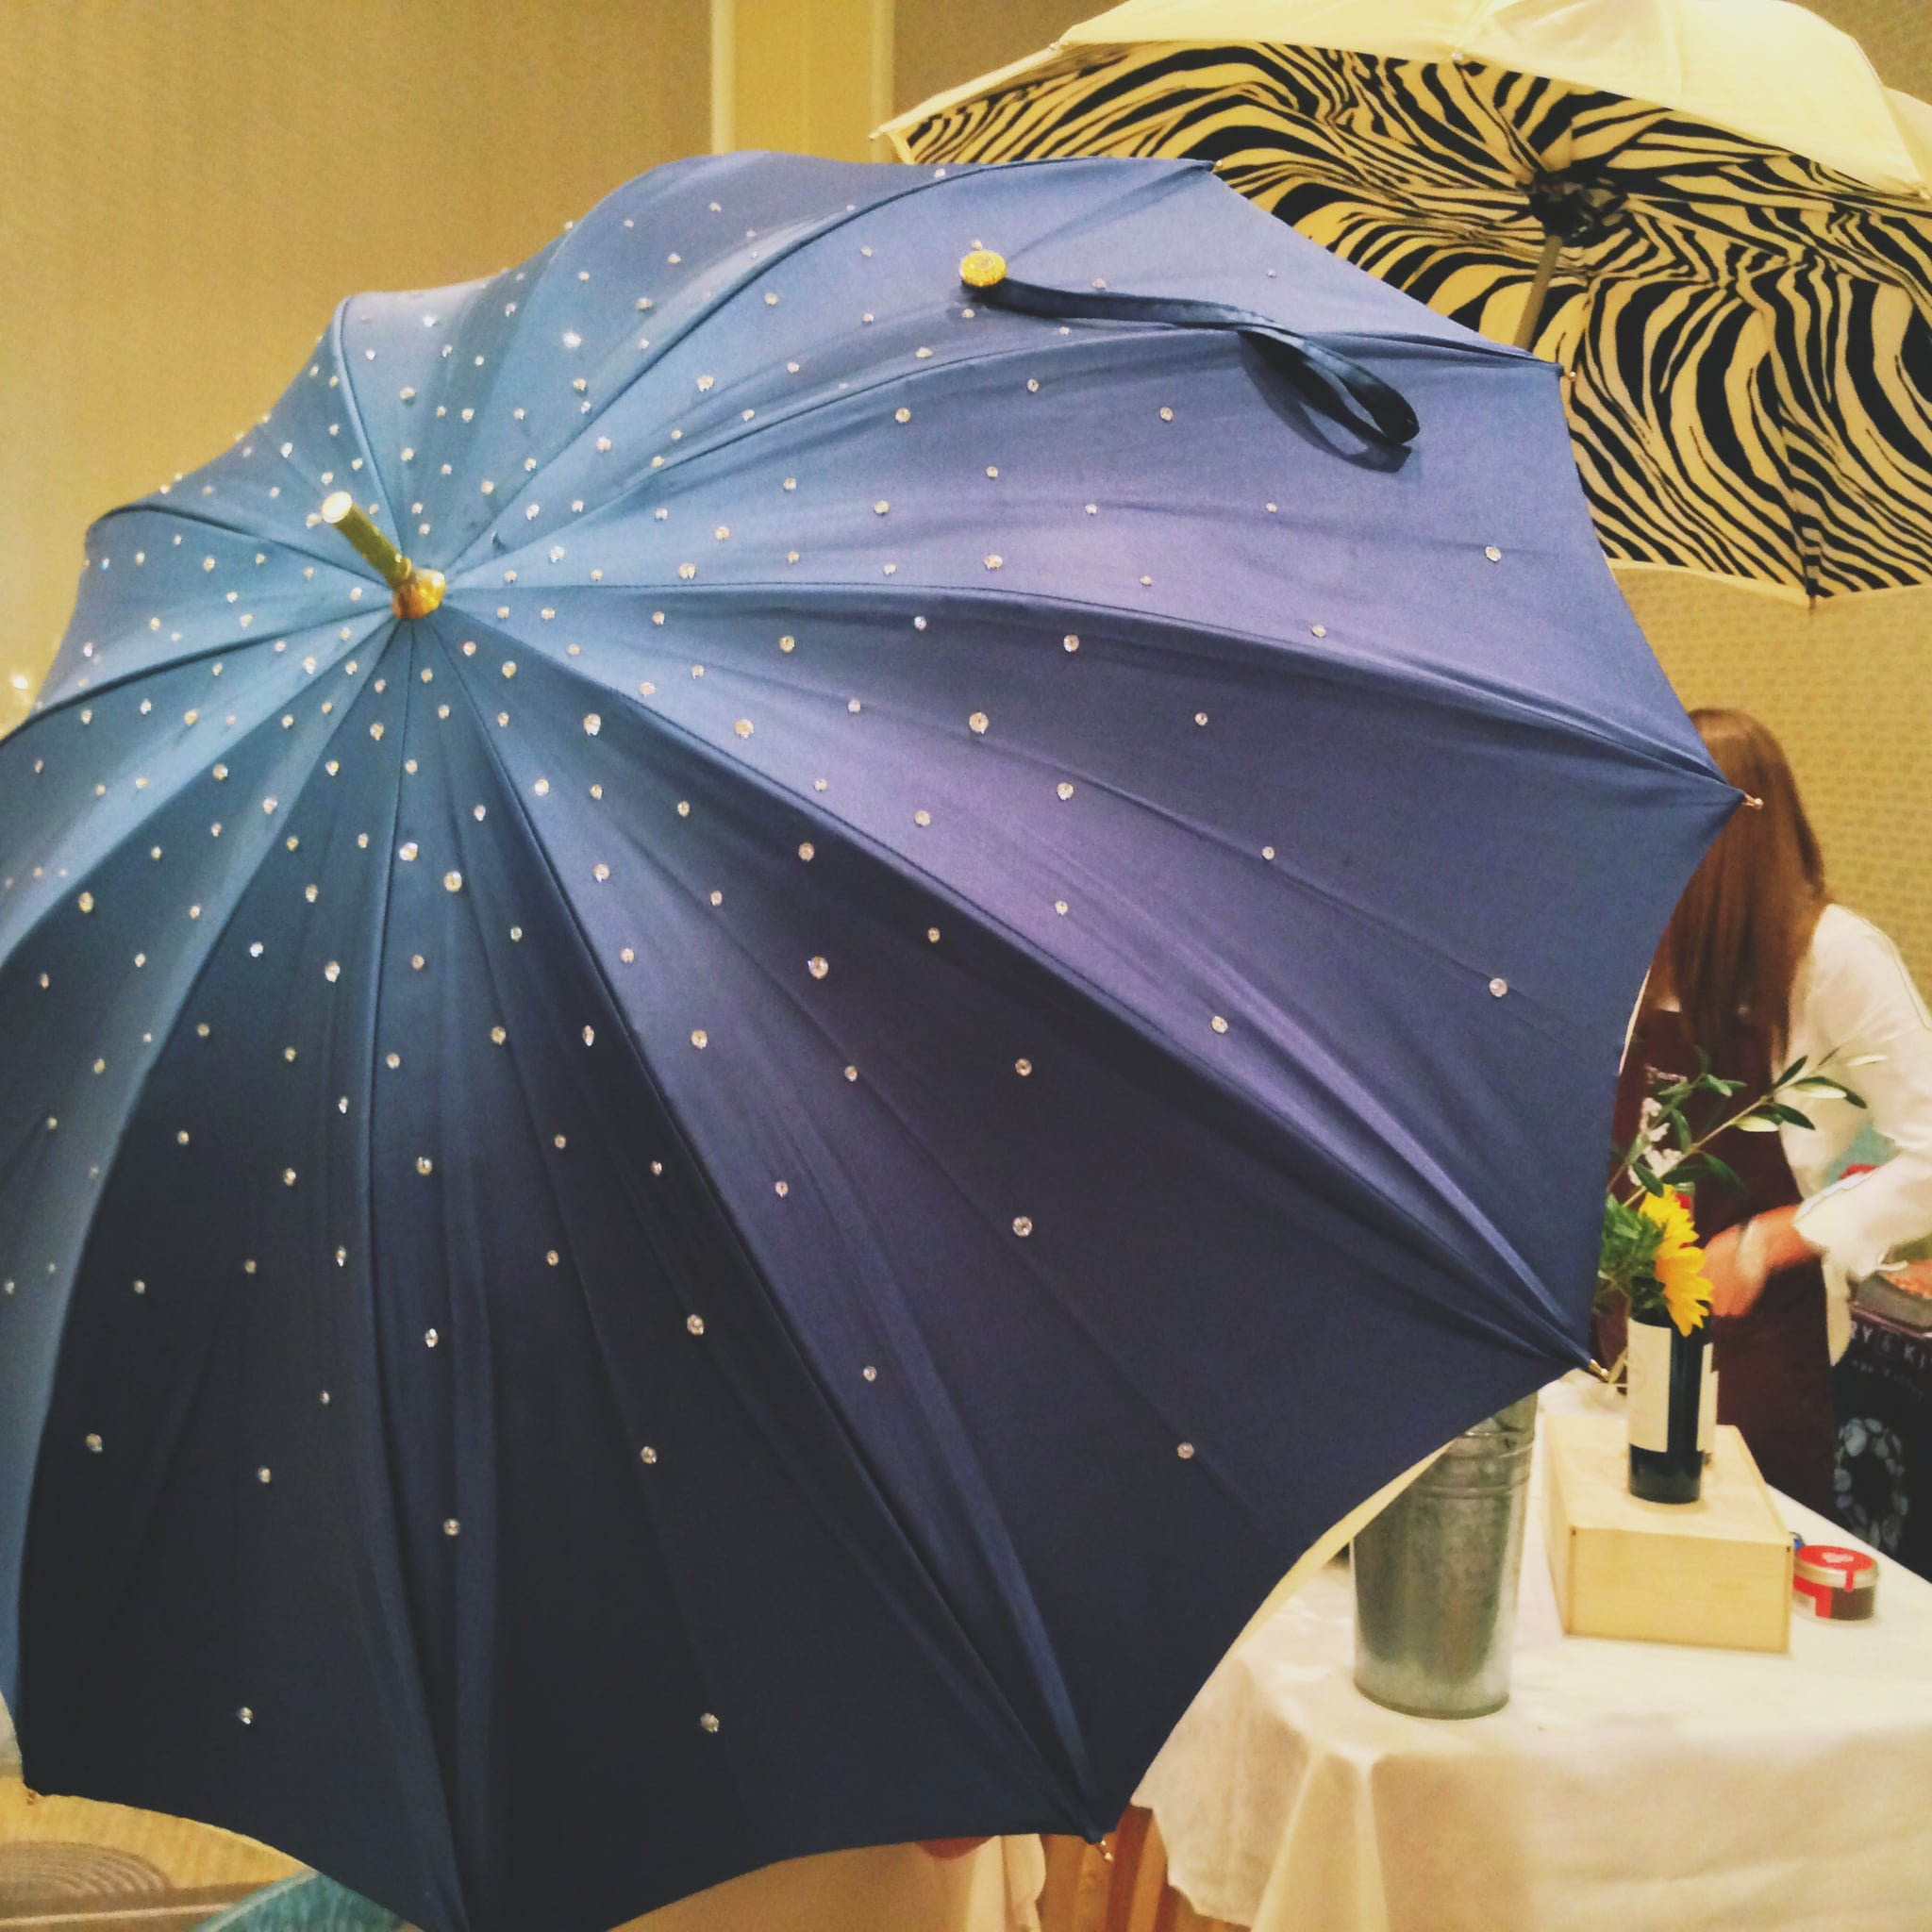 Bedazzled Parasols